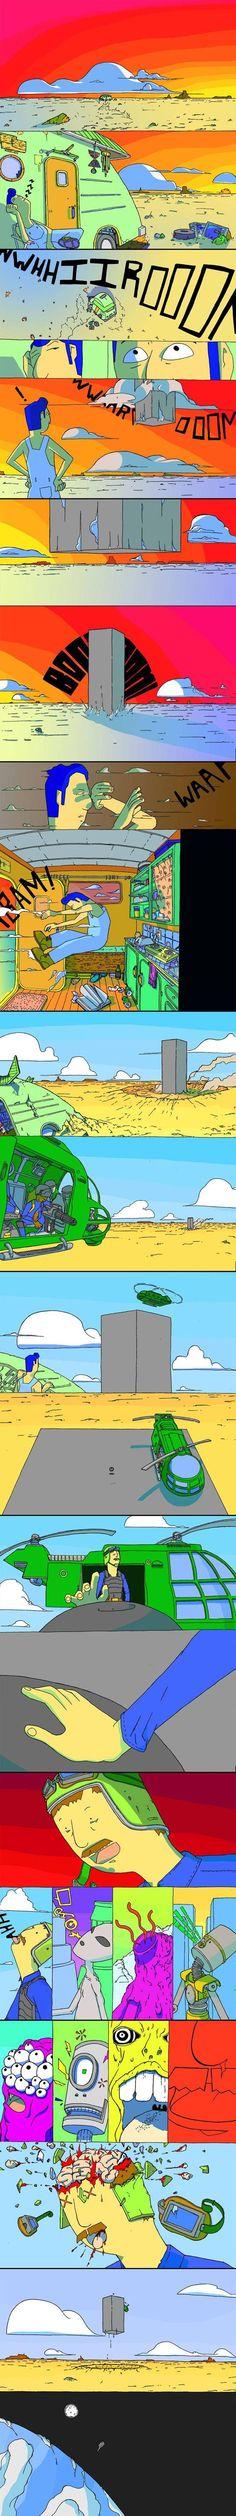 Nunca se aproxime da grande rocha alienígena.